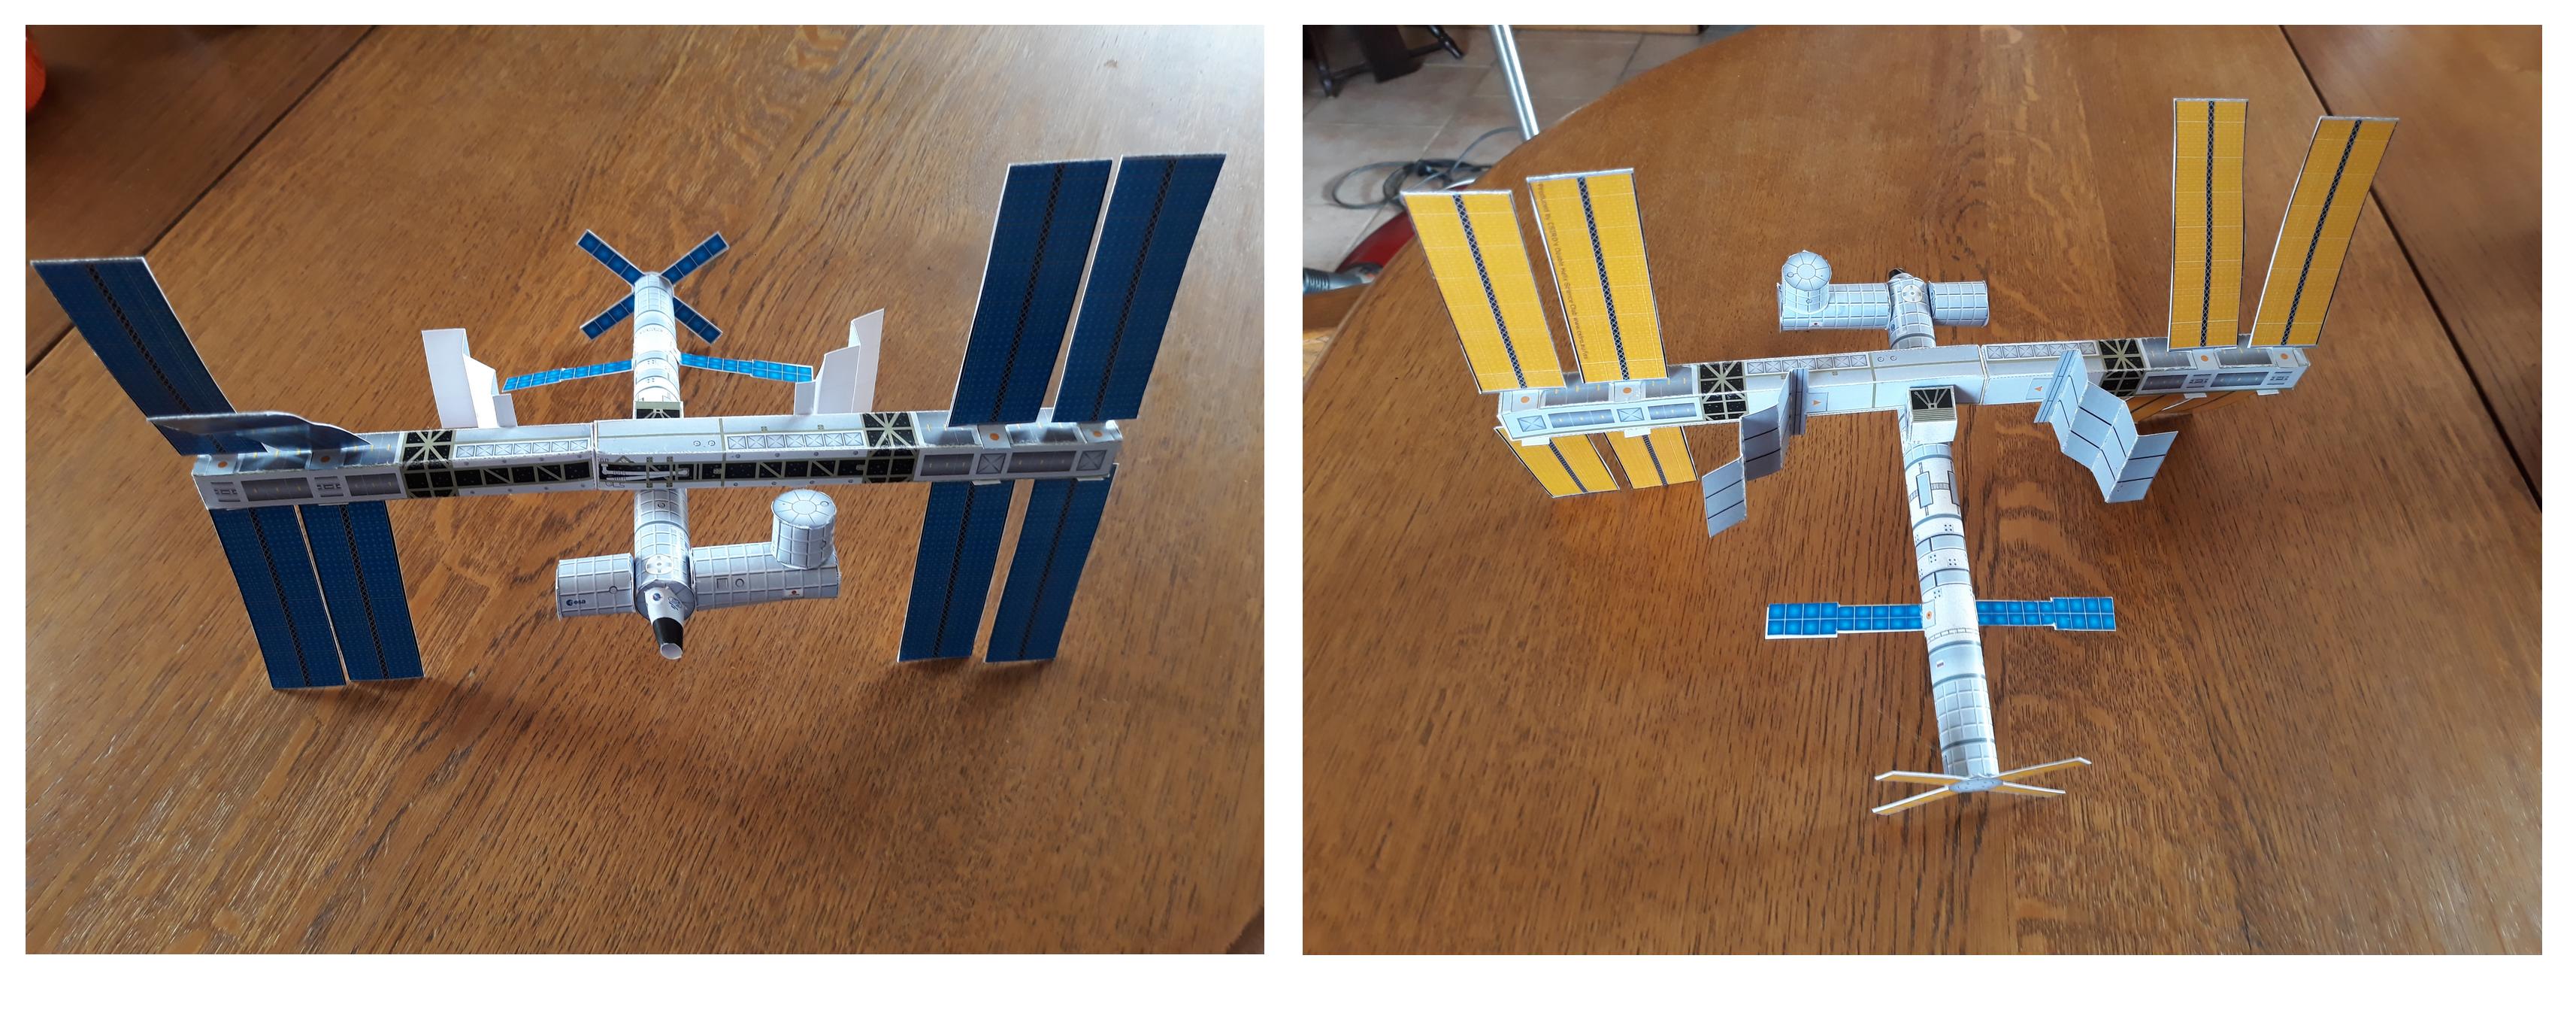 presentation maquette ISS